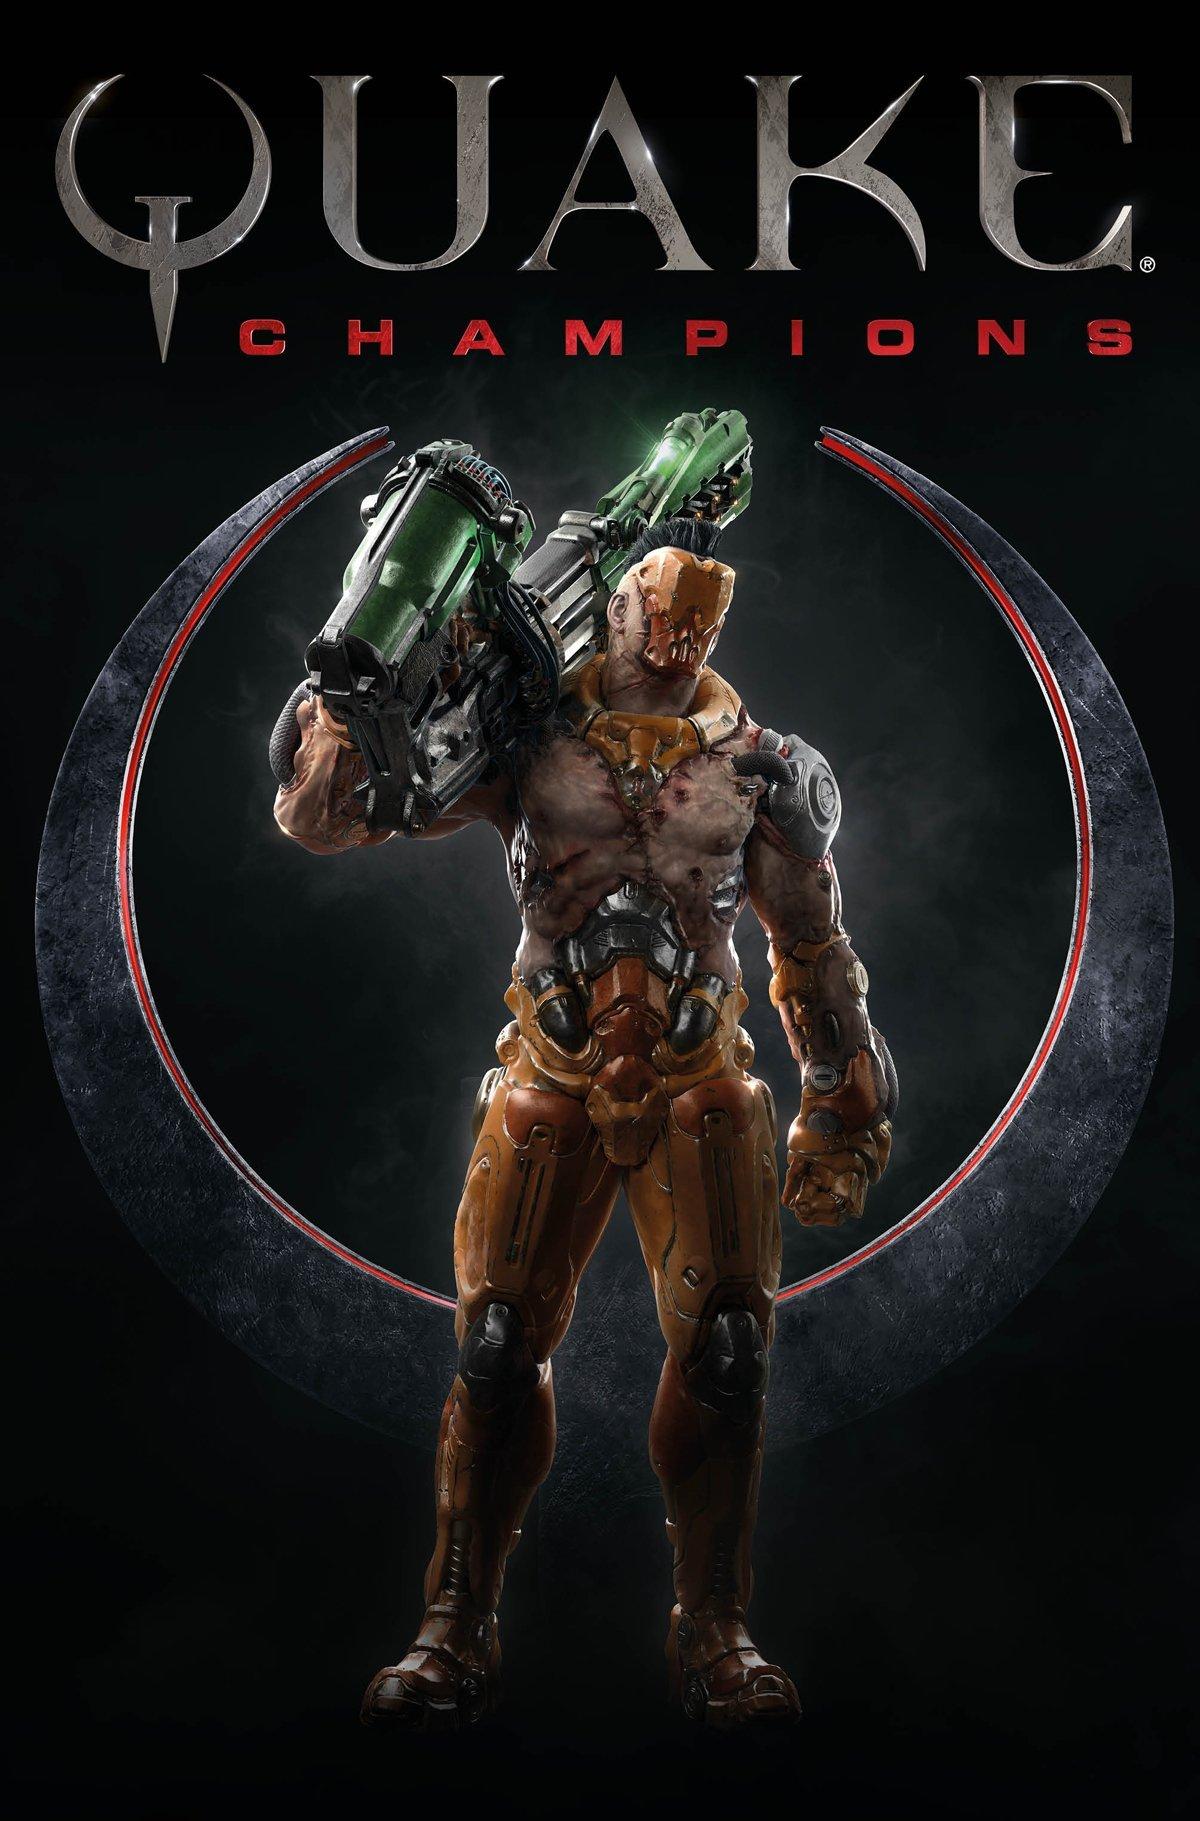 Quake Champions (Video Game 2018) - IMDb